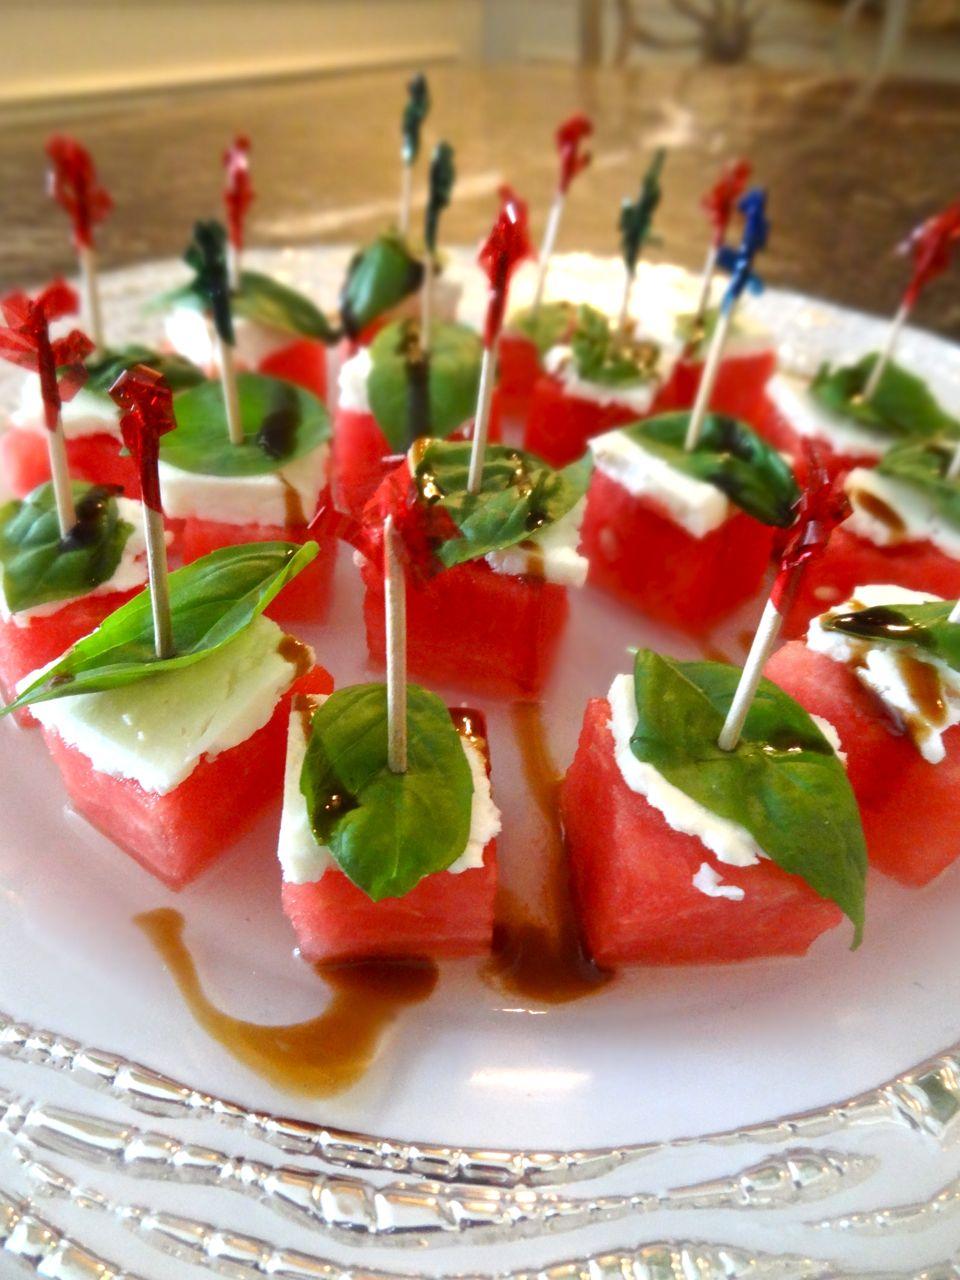 Scrumpdillyicious: Watermelon & Feta Skewers with Fresh Basil